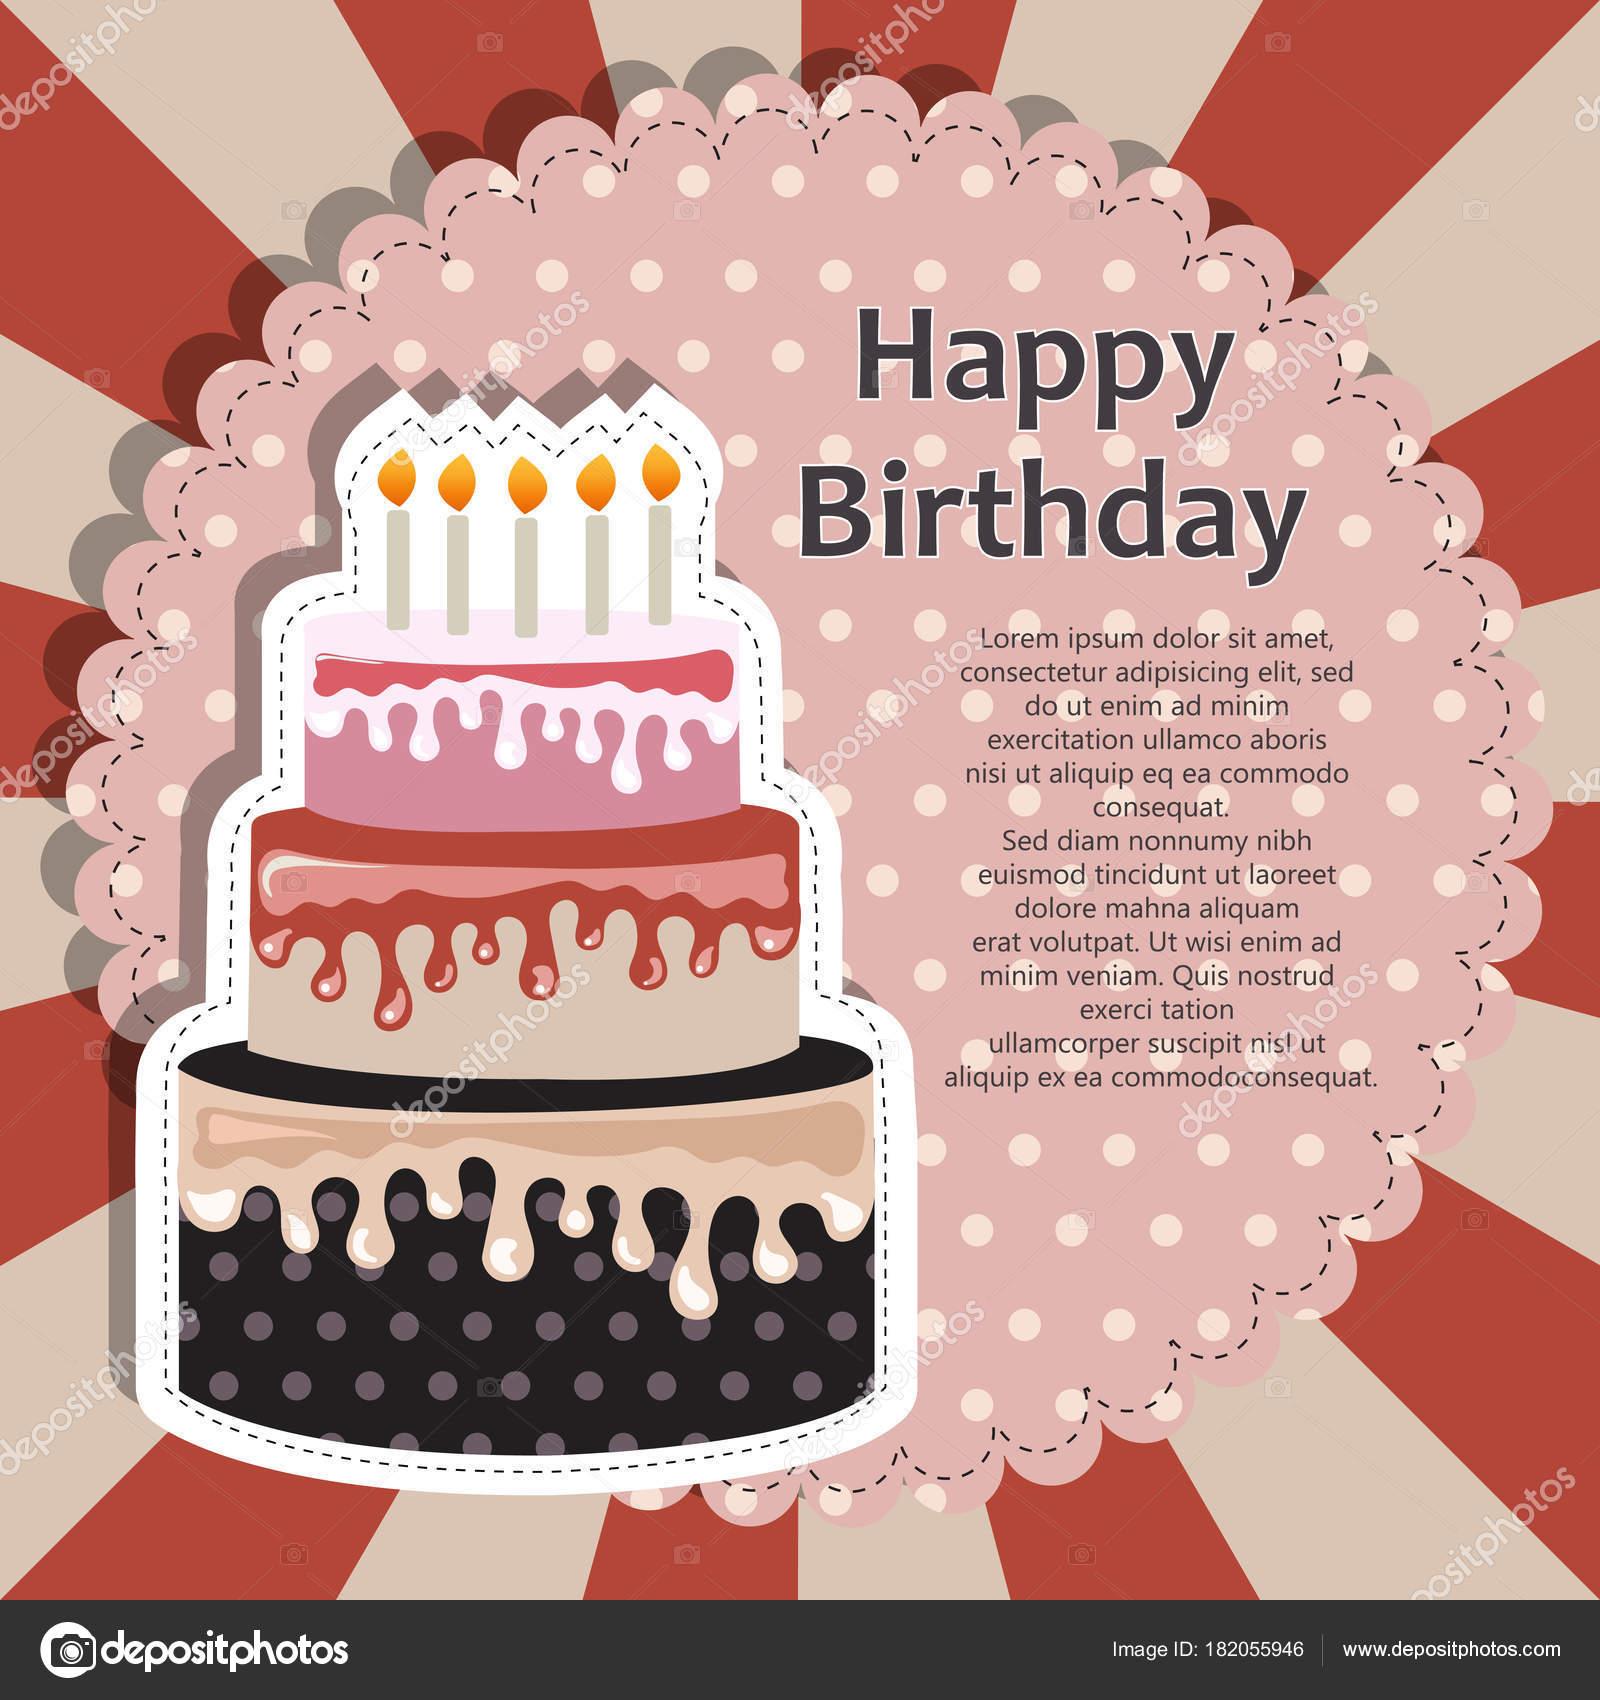 Birthday Card Cake Concept Birthdays Valentine Day Weddings Flat